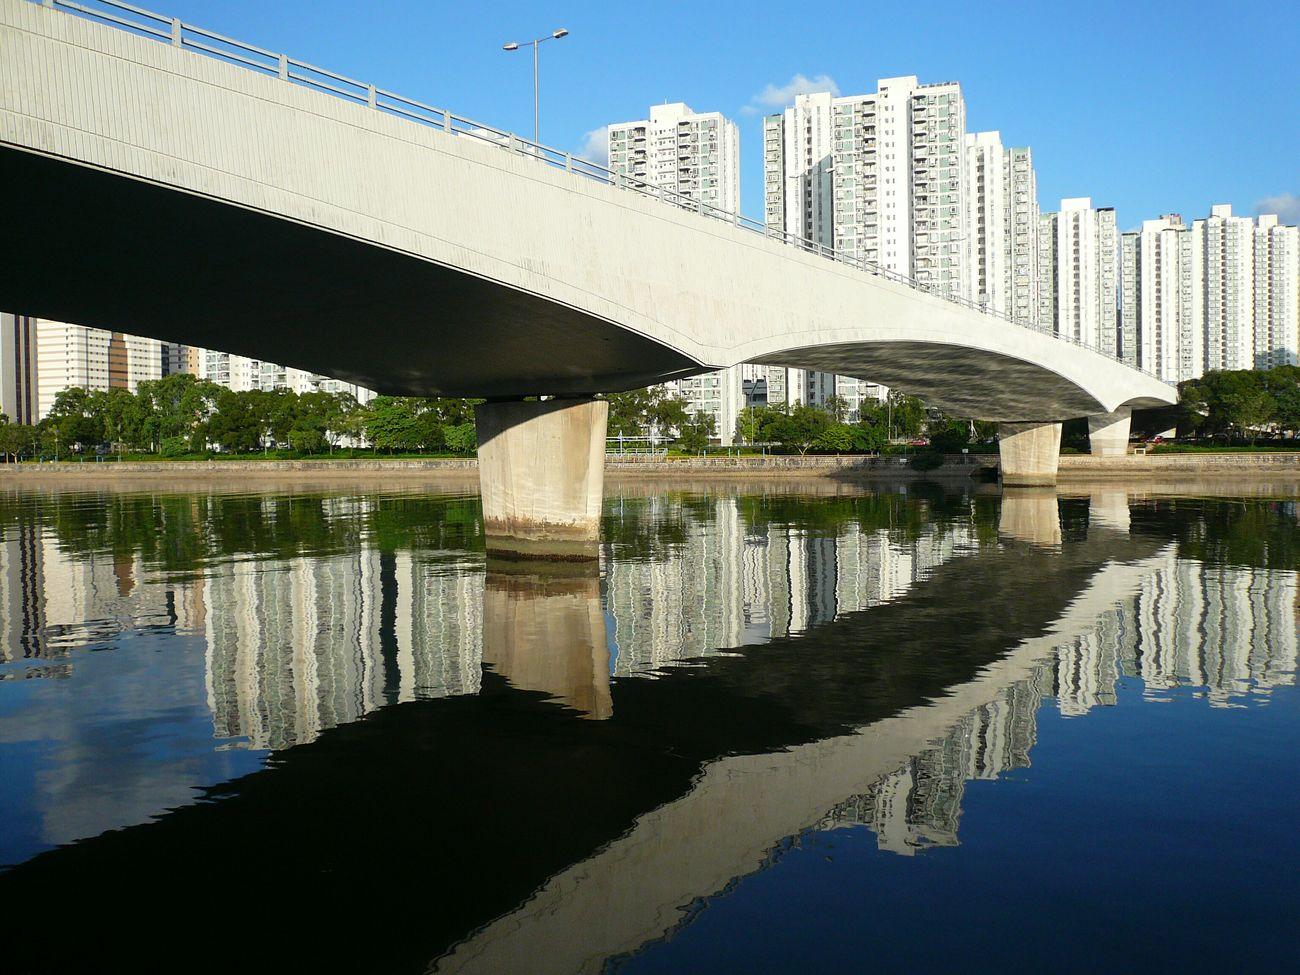 Hong Kong Shatin Bridge